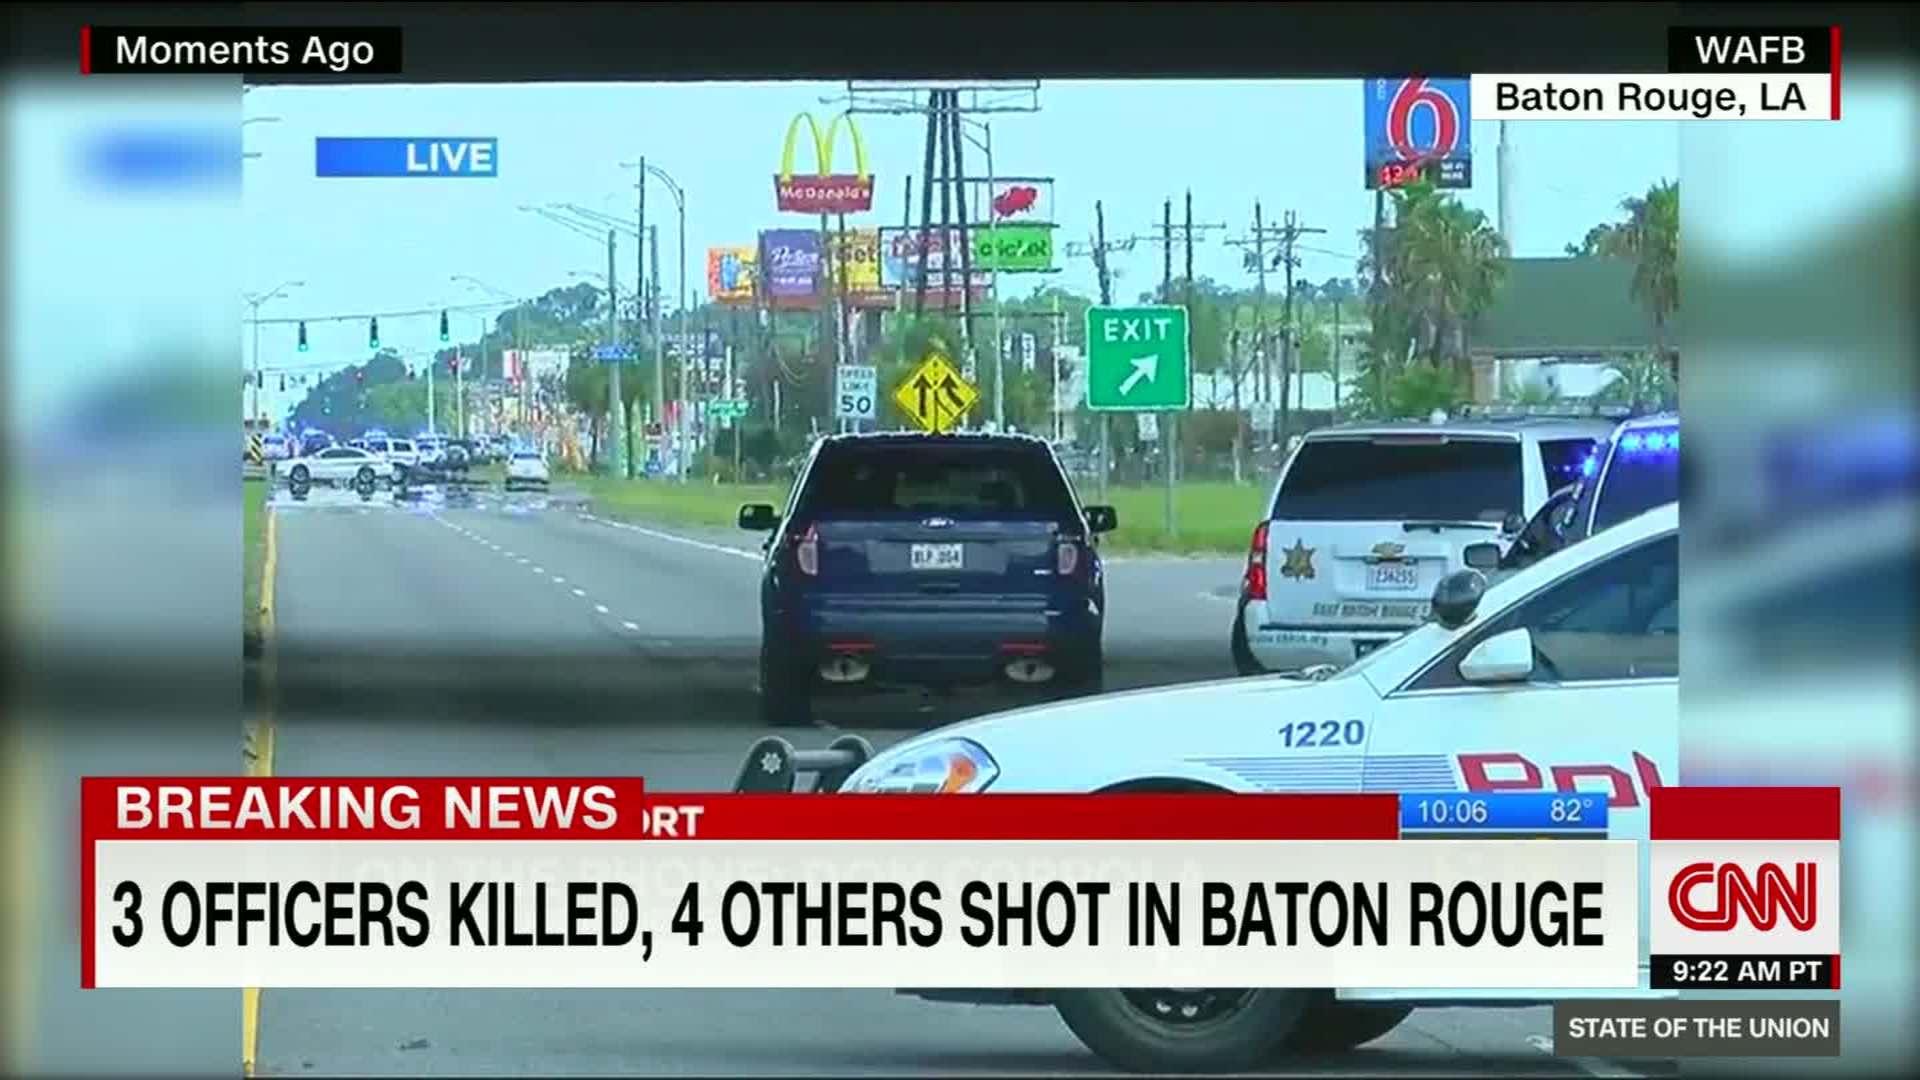 New video of gunfire exchange in Baton Rouge - CNN Video